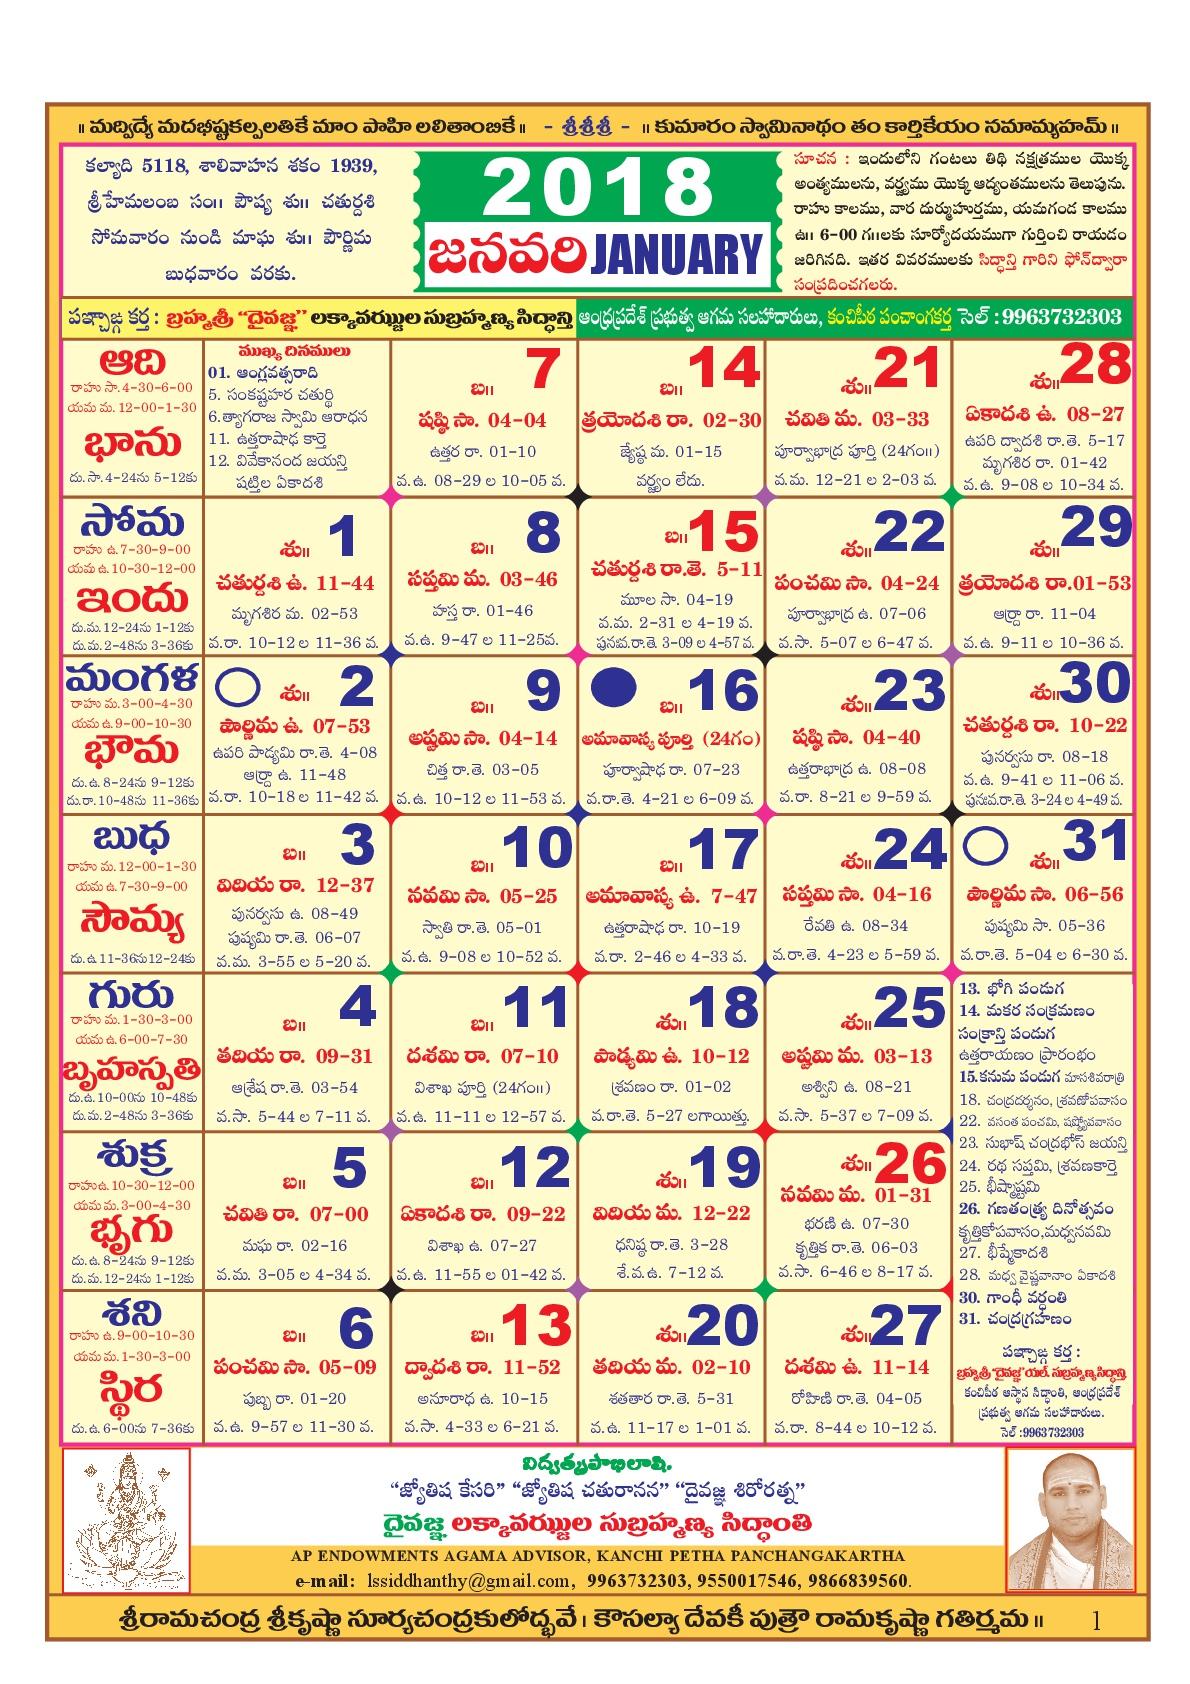 Telugu Calendar 2018 with Tithi, Festivals, Holidays List PDF